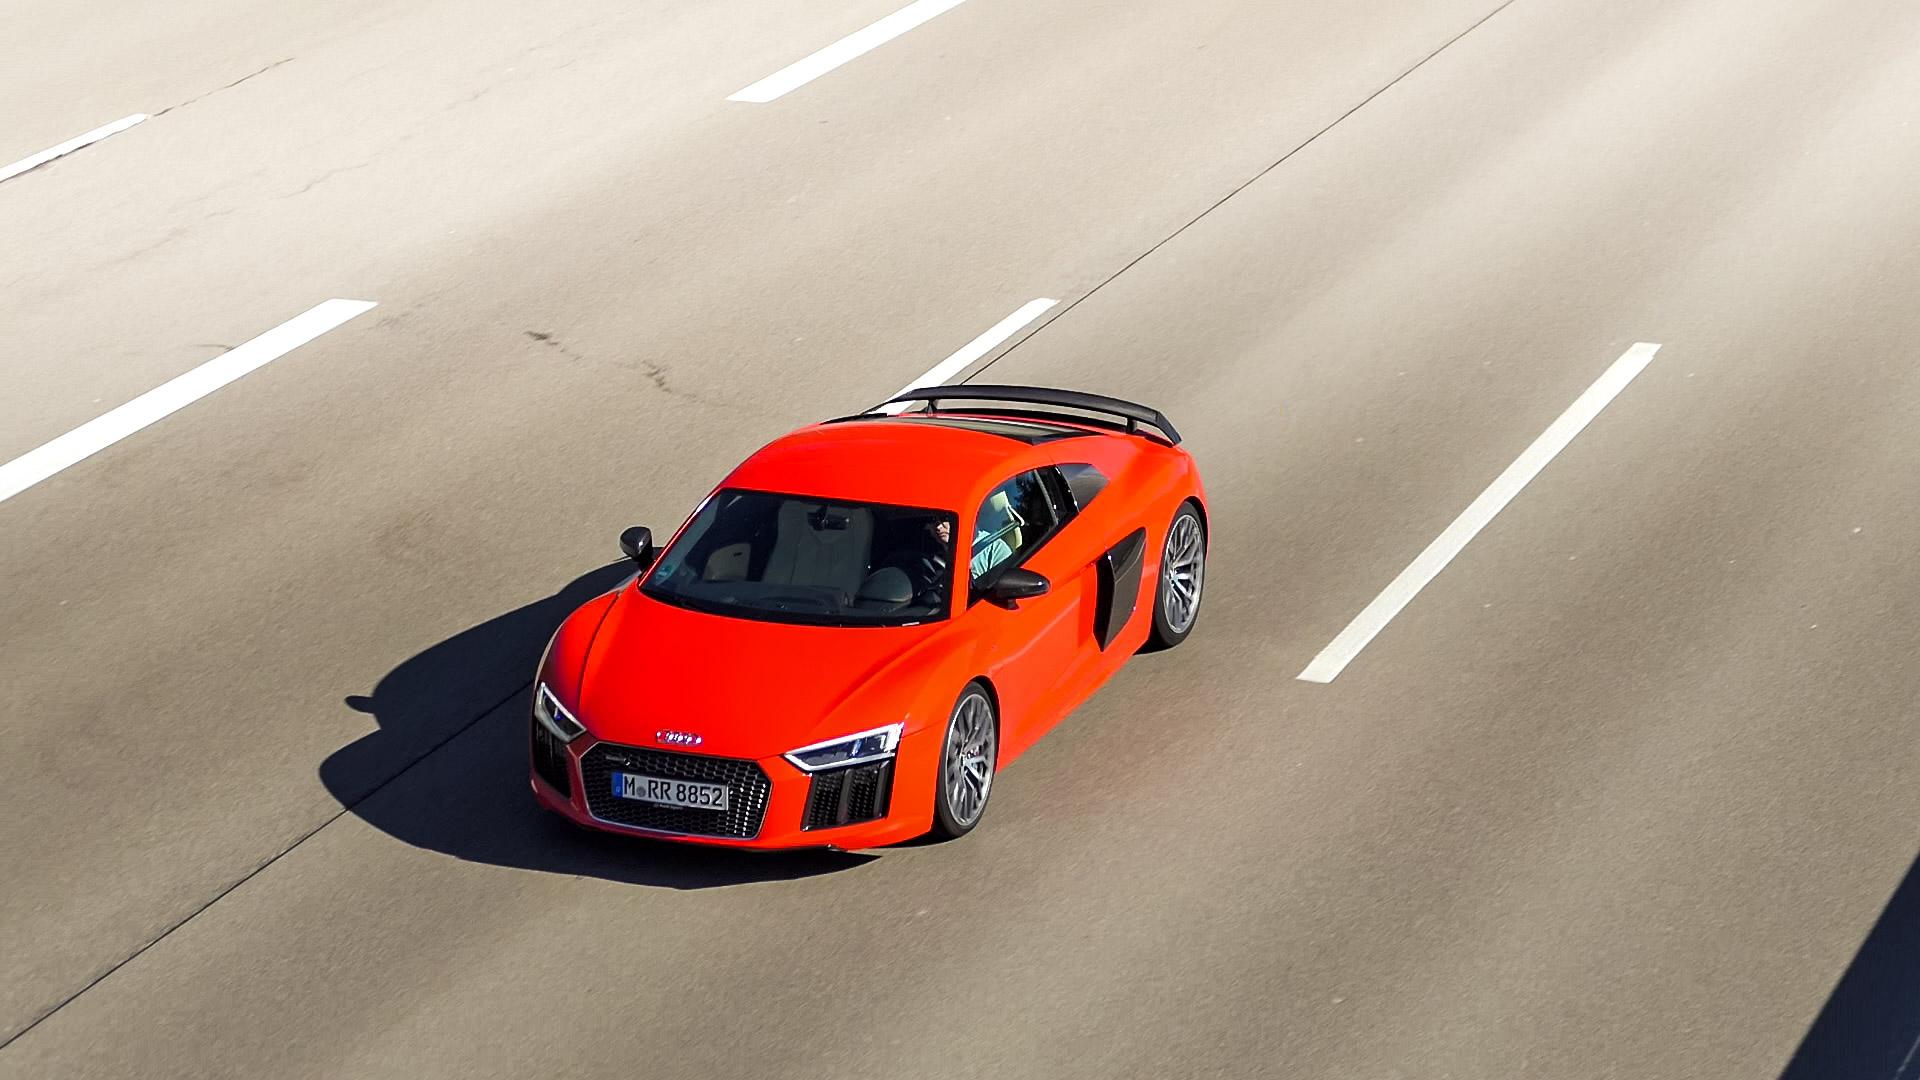 Audi R8 V10 - M-RR-8852